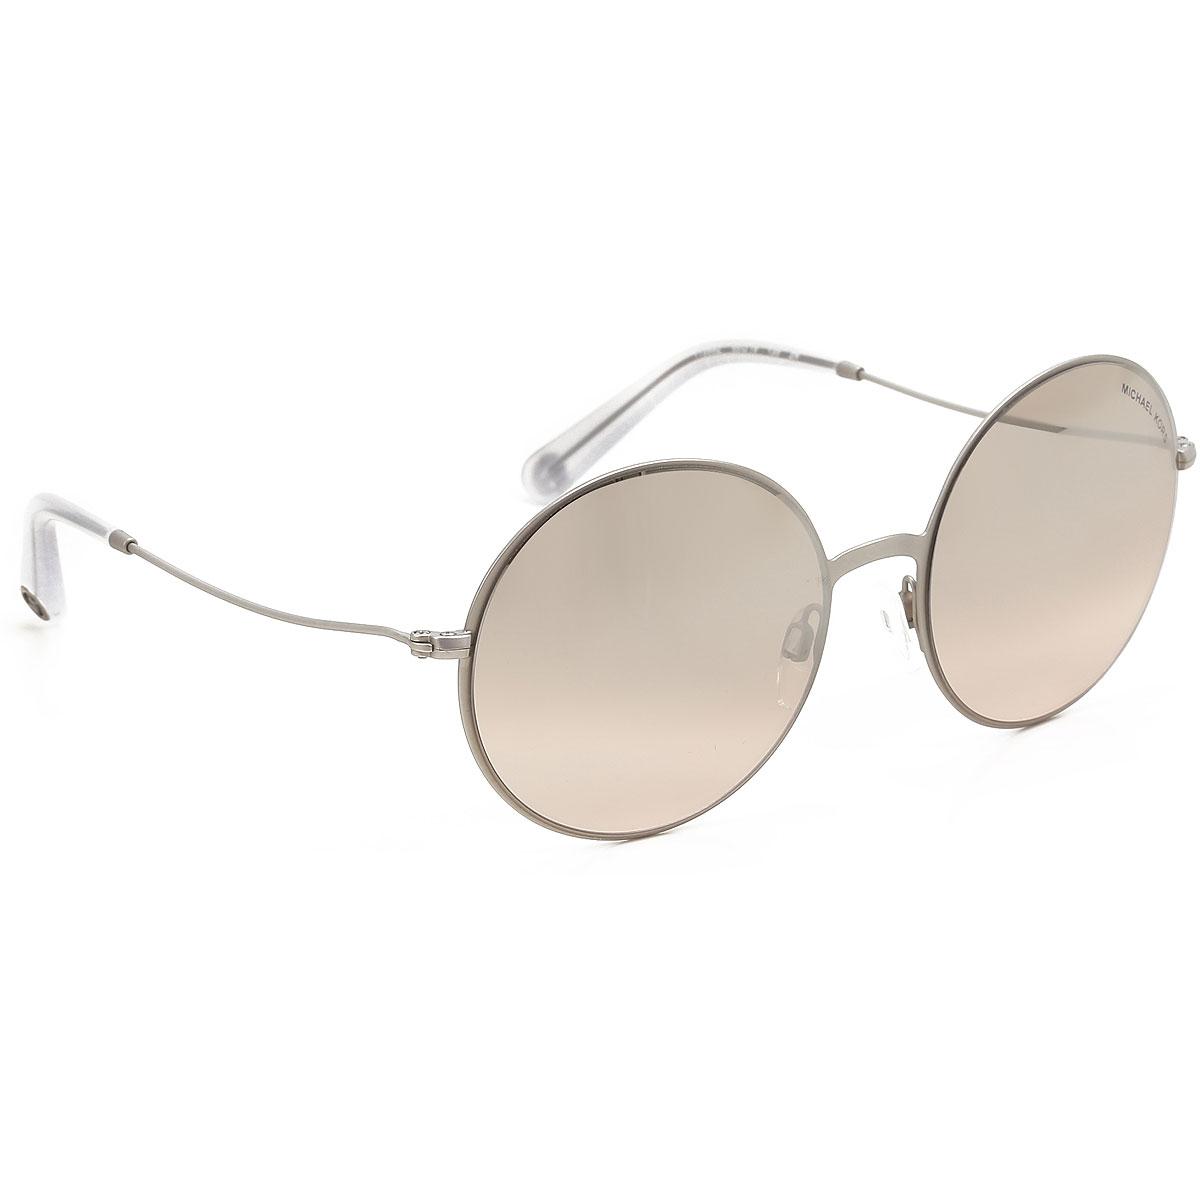 Michael Kors Sunglasses On Sale, Silver, 2017